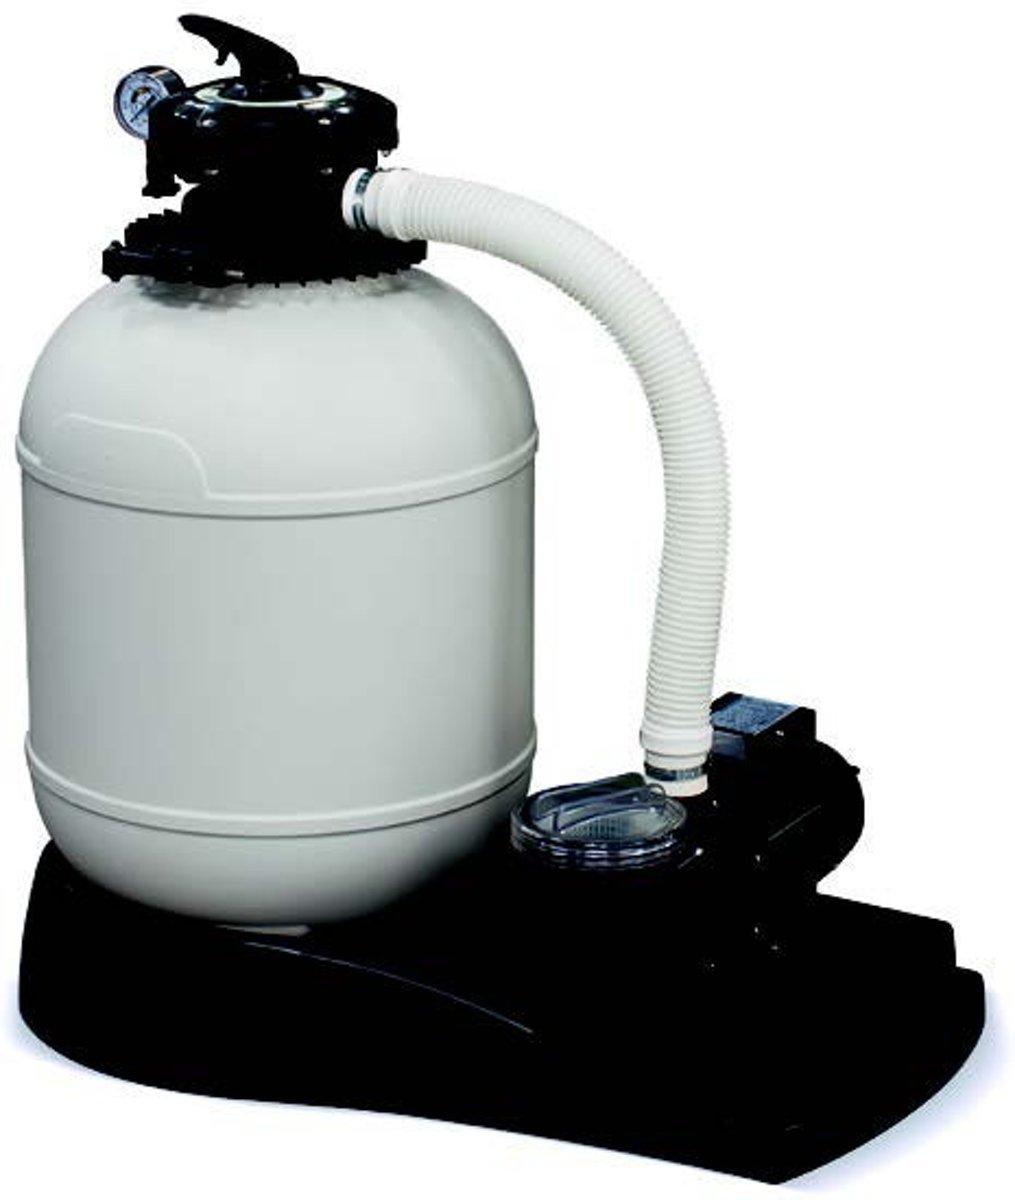 Top filtersysteem P-XPERT4 Ø300mm zandfilter zwembad